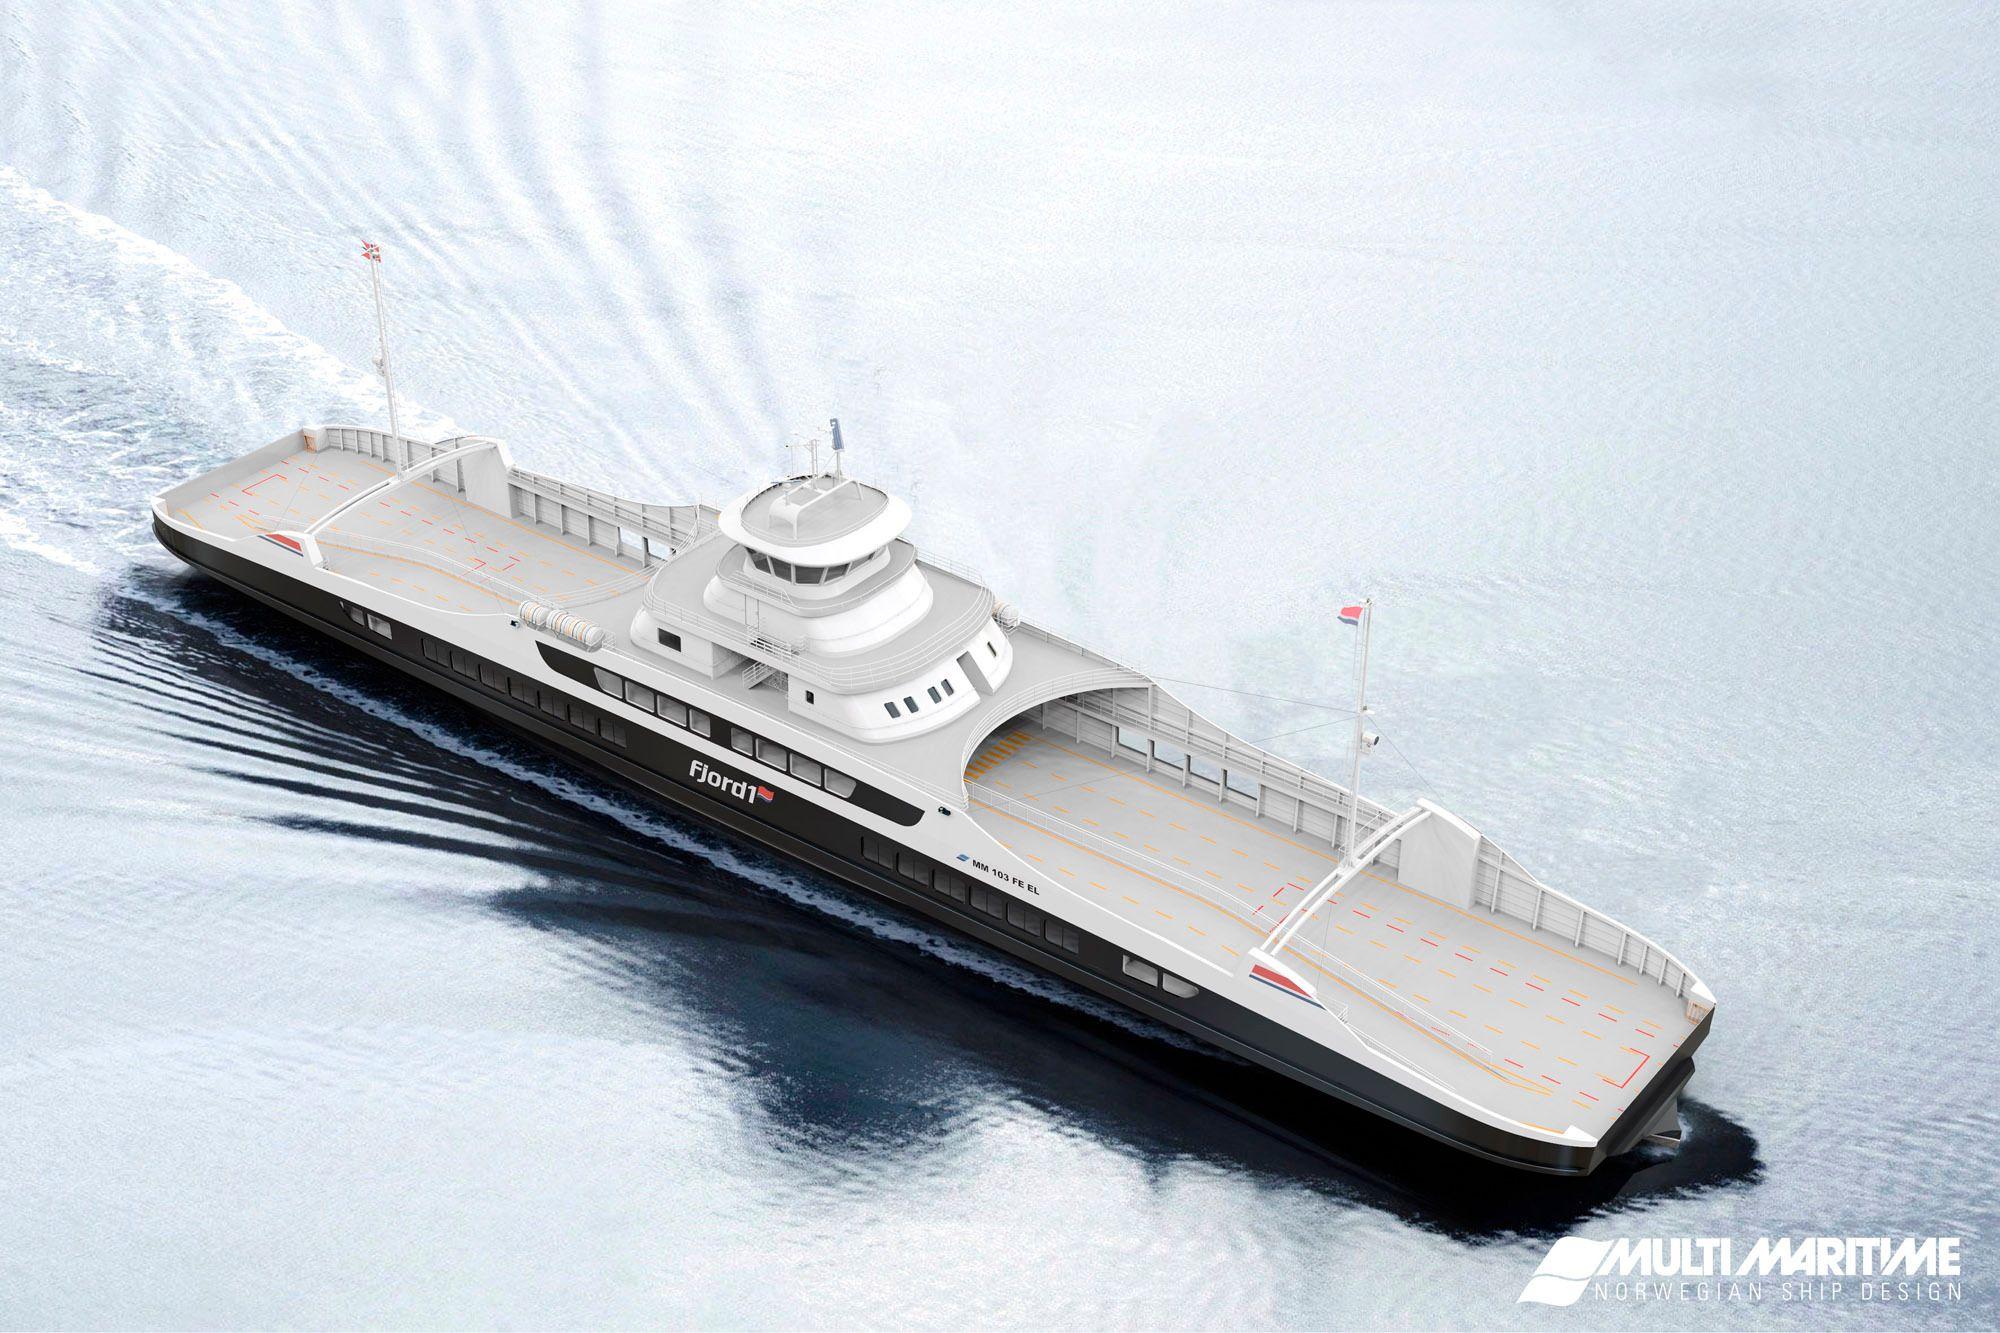 Fjord1 elbil 2019